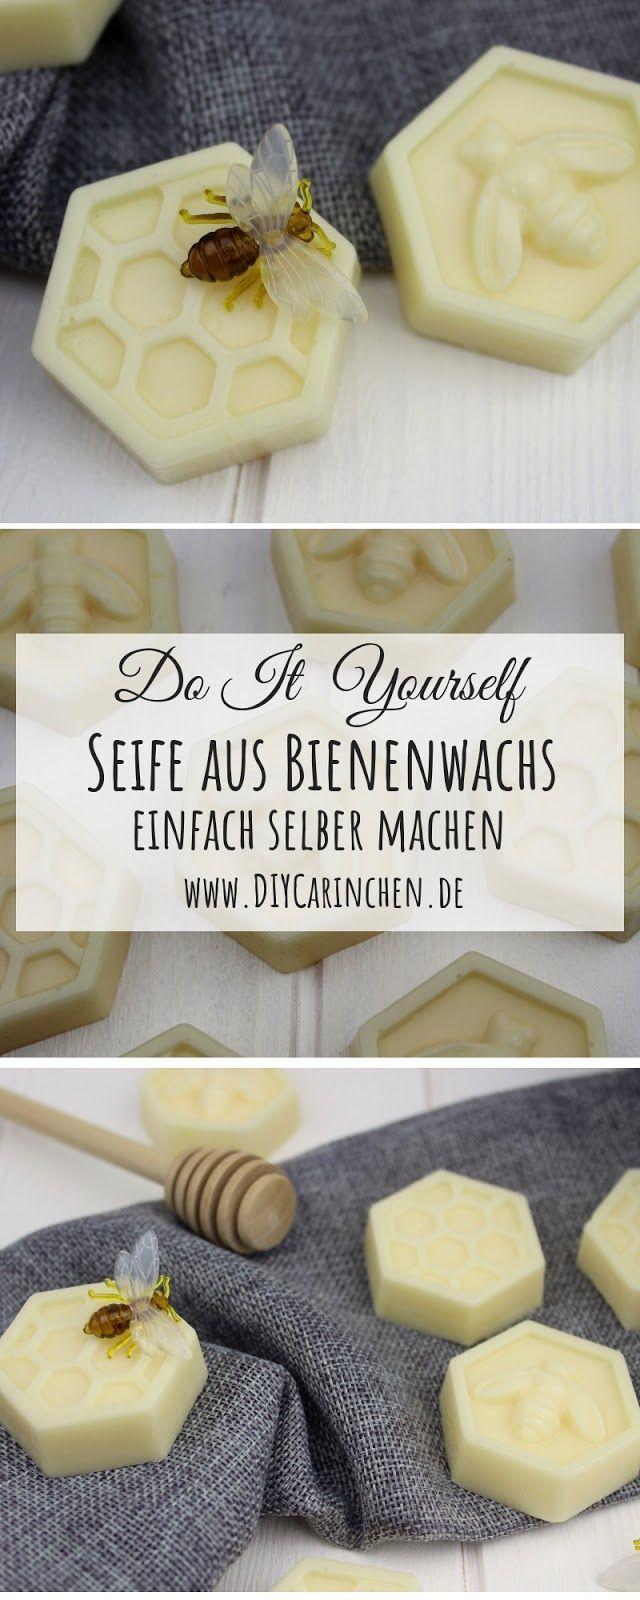 DIY: Seife aus Bienenwachs selber machen - perfekte Geschenkidee zu jedem Anlass: DIY, Basteln, Selbermachen, Seife selber machen, Geschenke aus der Küche, Geschenkidee, Weihnachtsgeschenk, Kosmetik, Bienenwachs, Muttertag, Muttertagsgeschenk, Deko, Dekoration, Soap, Tutorial, Badezimmerdekoration, Home Made #diy #doityourself #basteln #selbermachen #seife #soap #diyundselbermachen